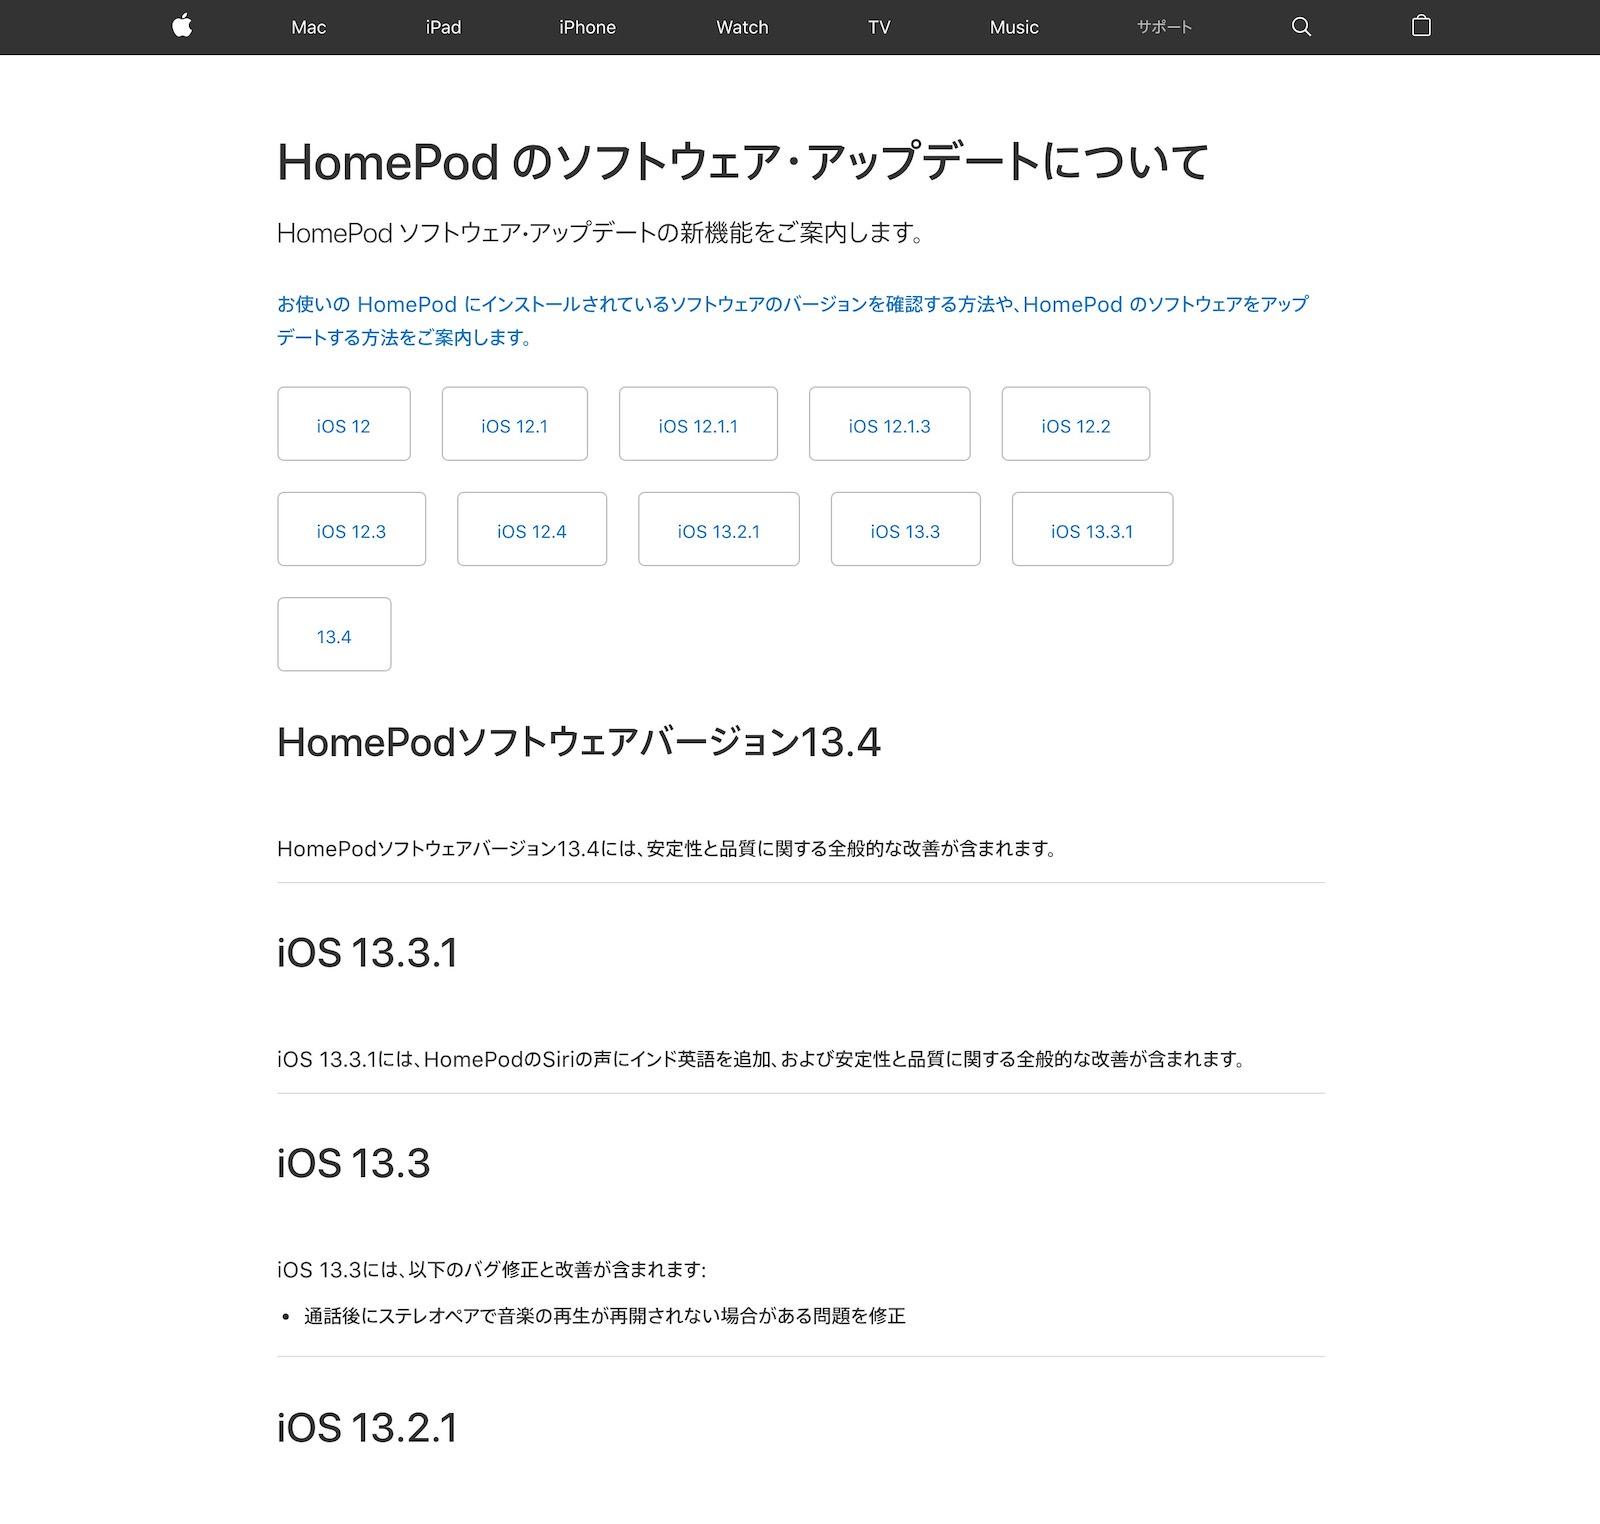 software-versions-of-homepod.jpg